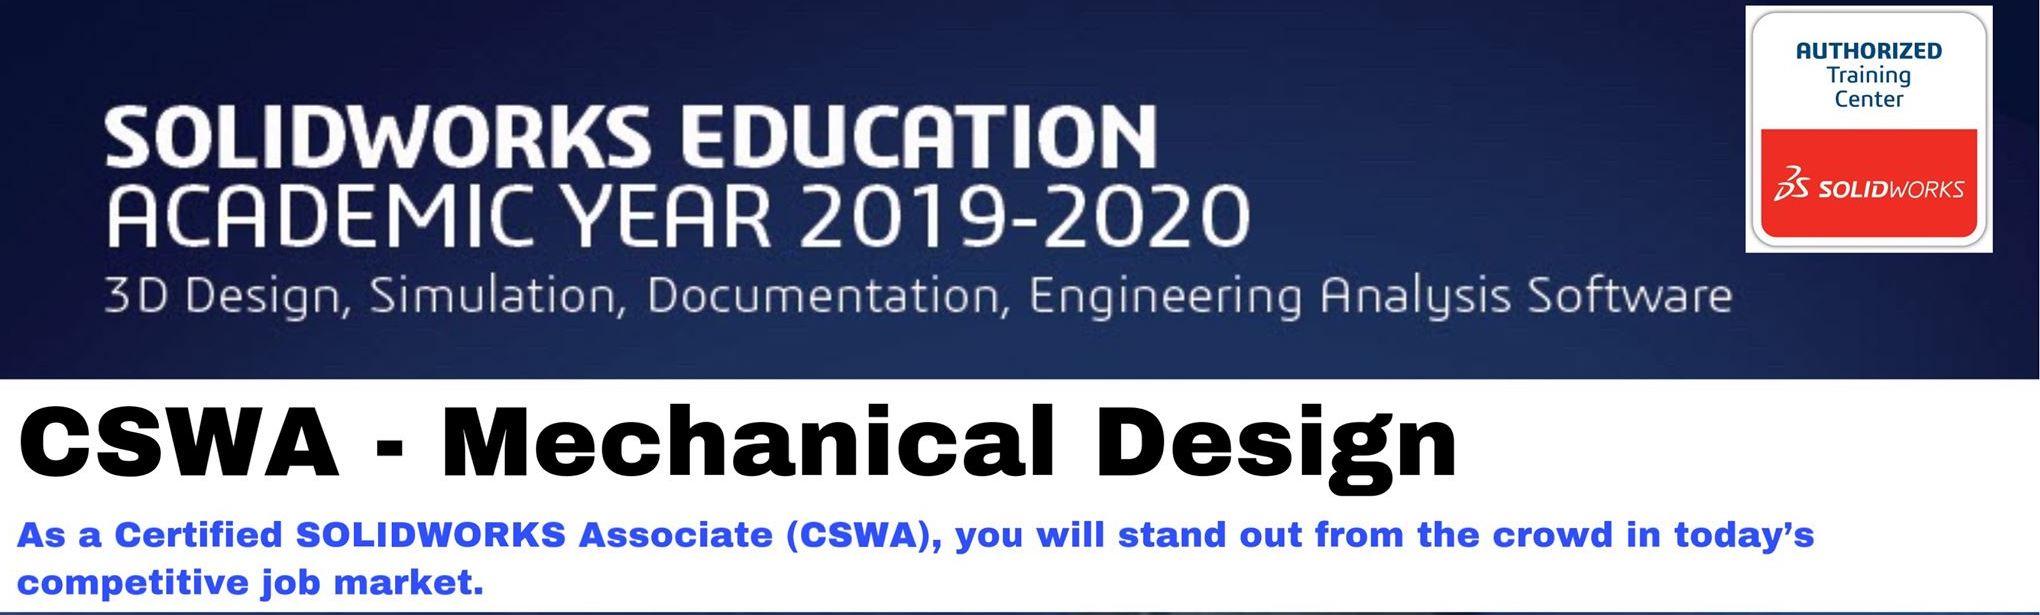 SolidWorks Certification Program-CSWA - Advanced Educare